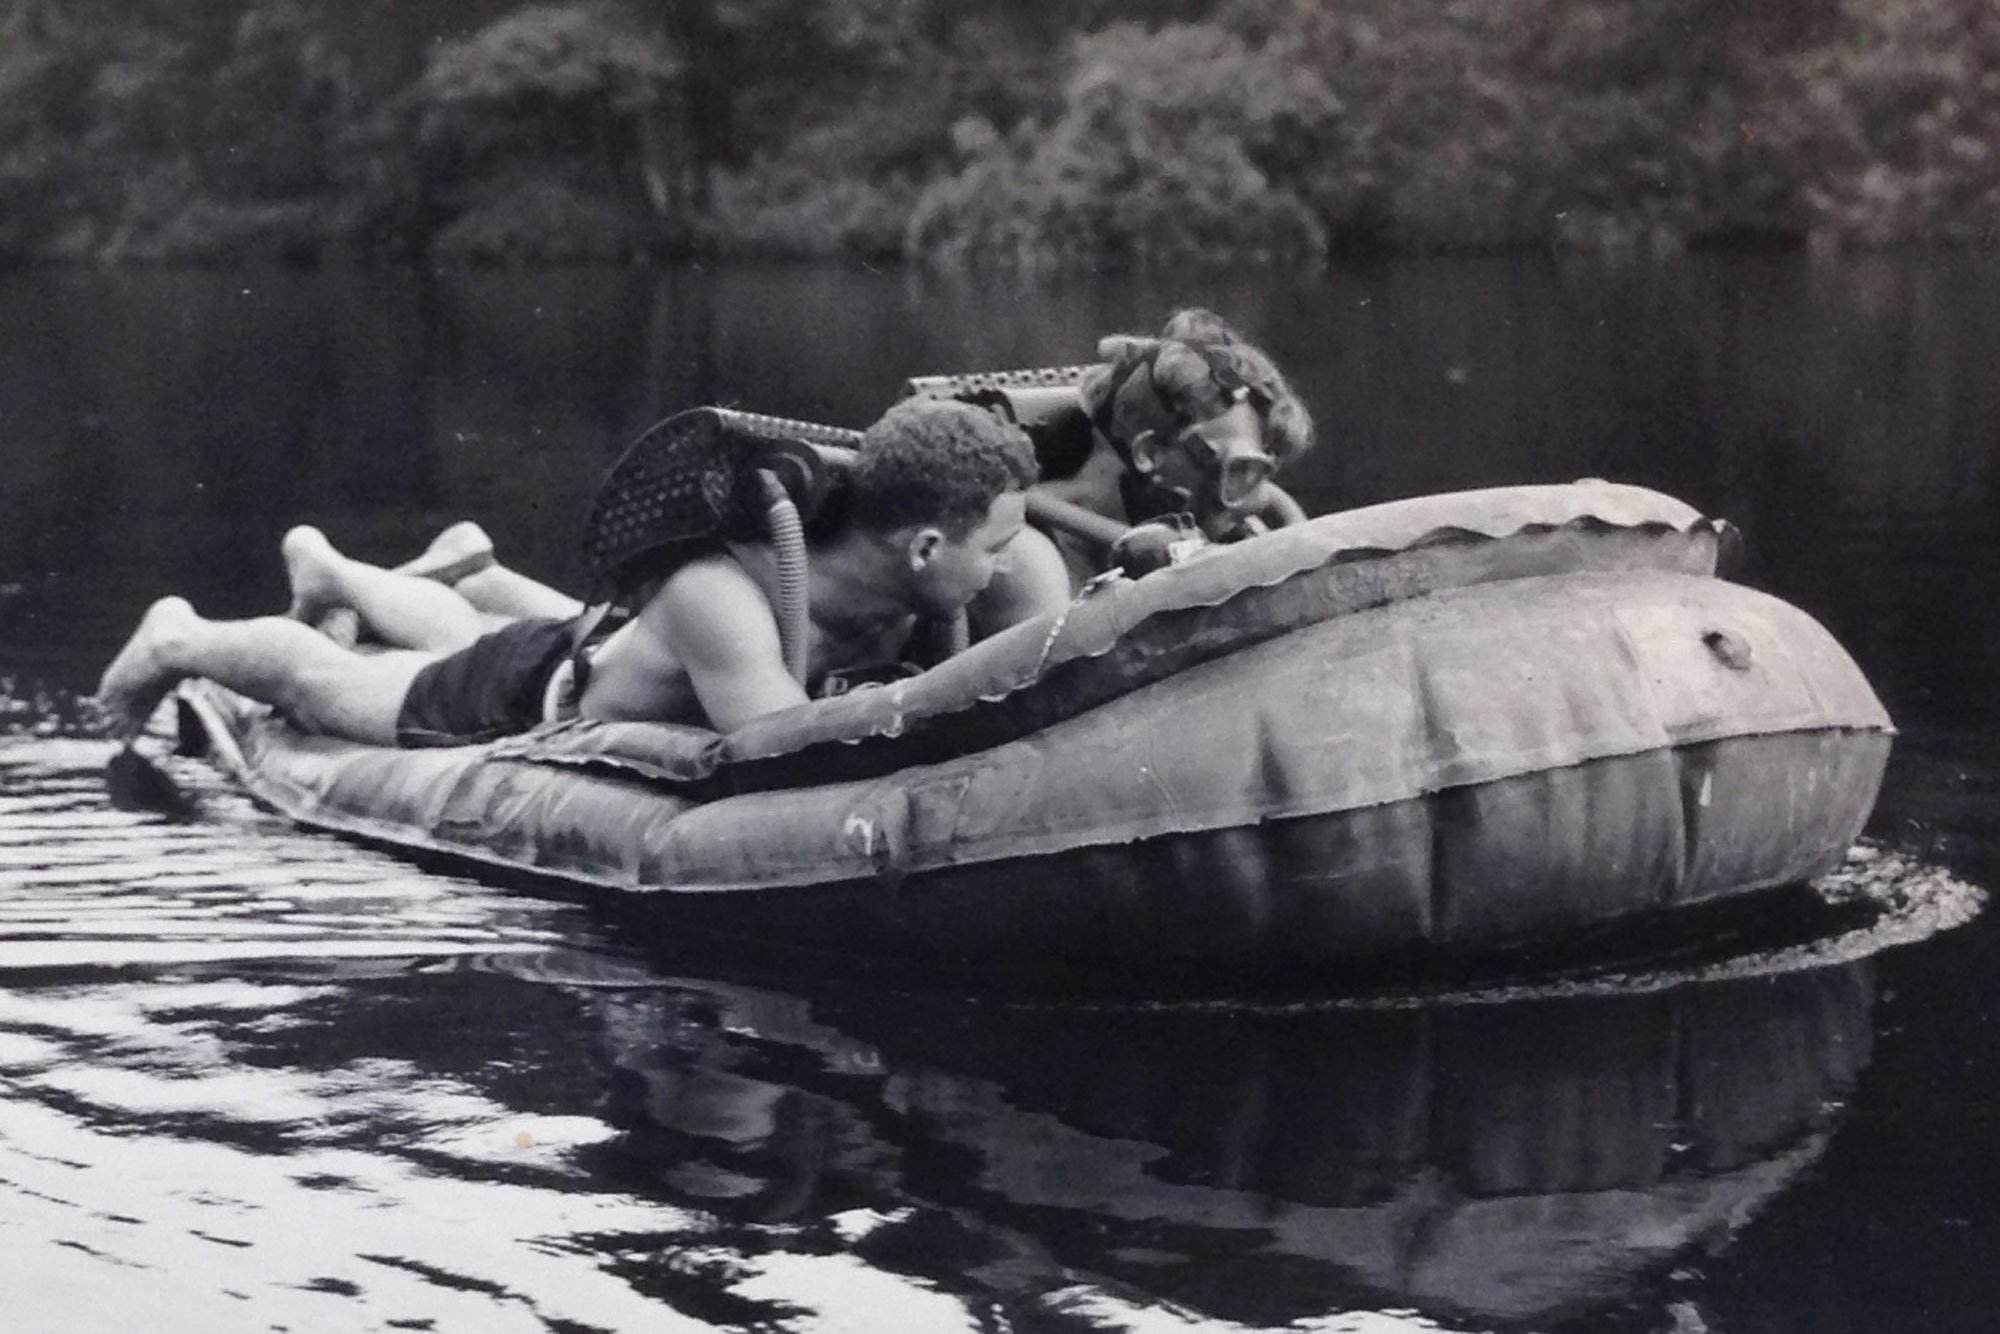 Nude boating virginia #12